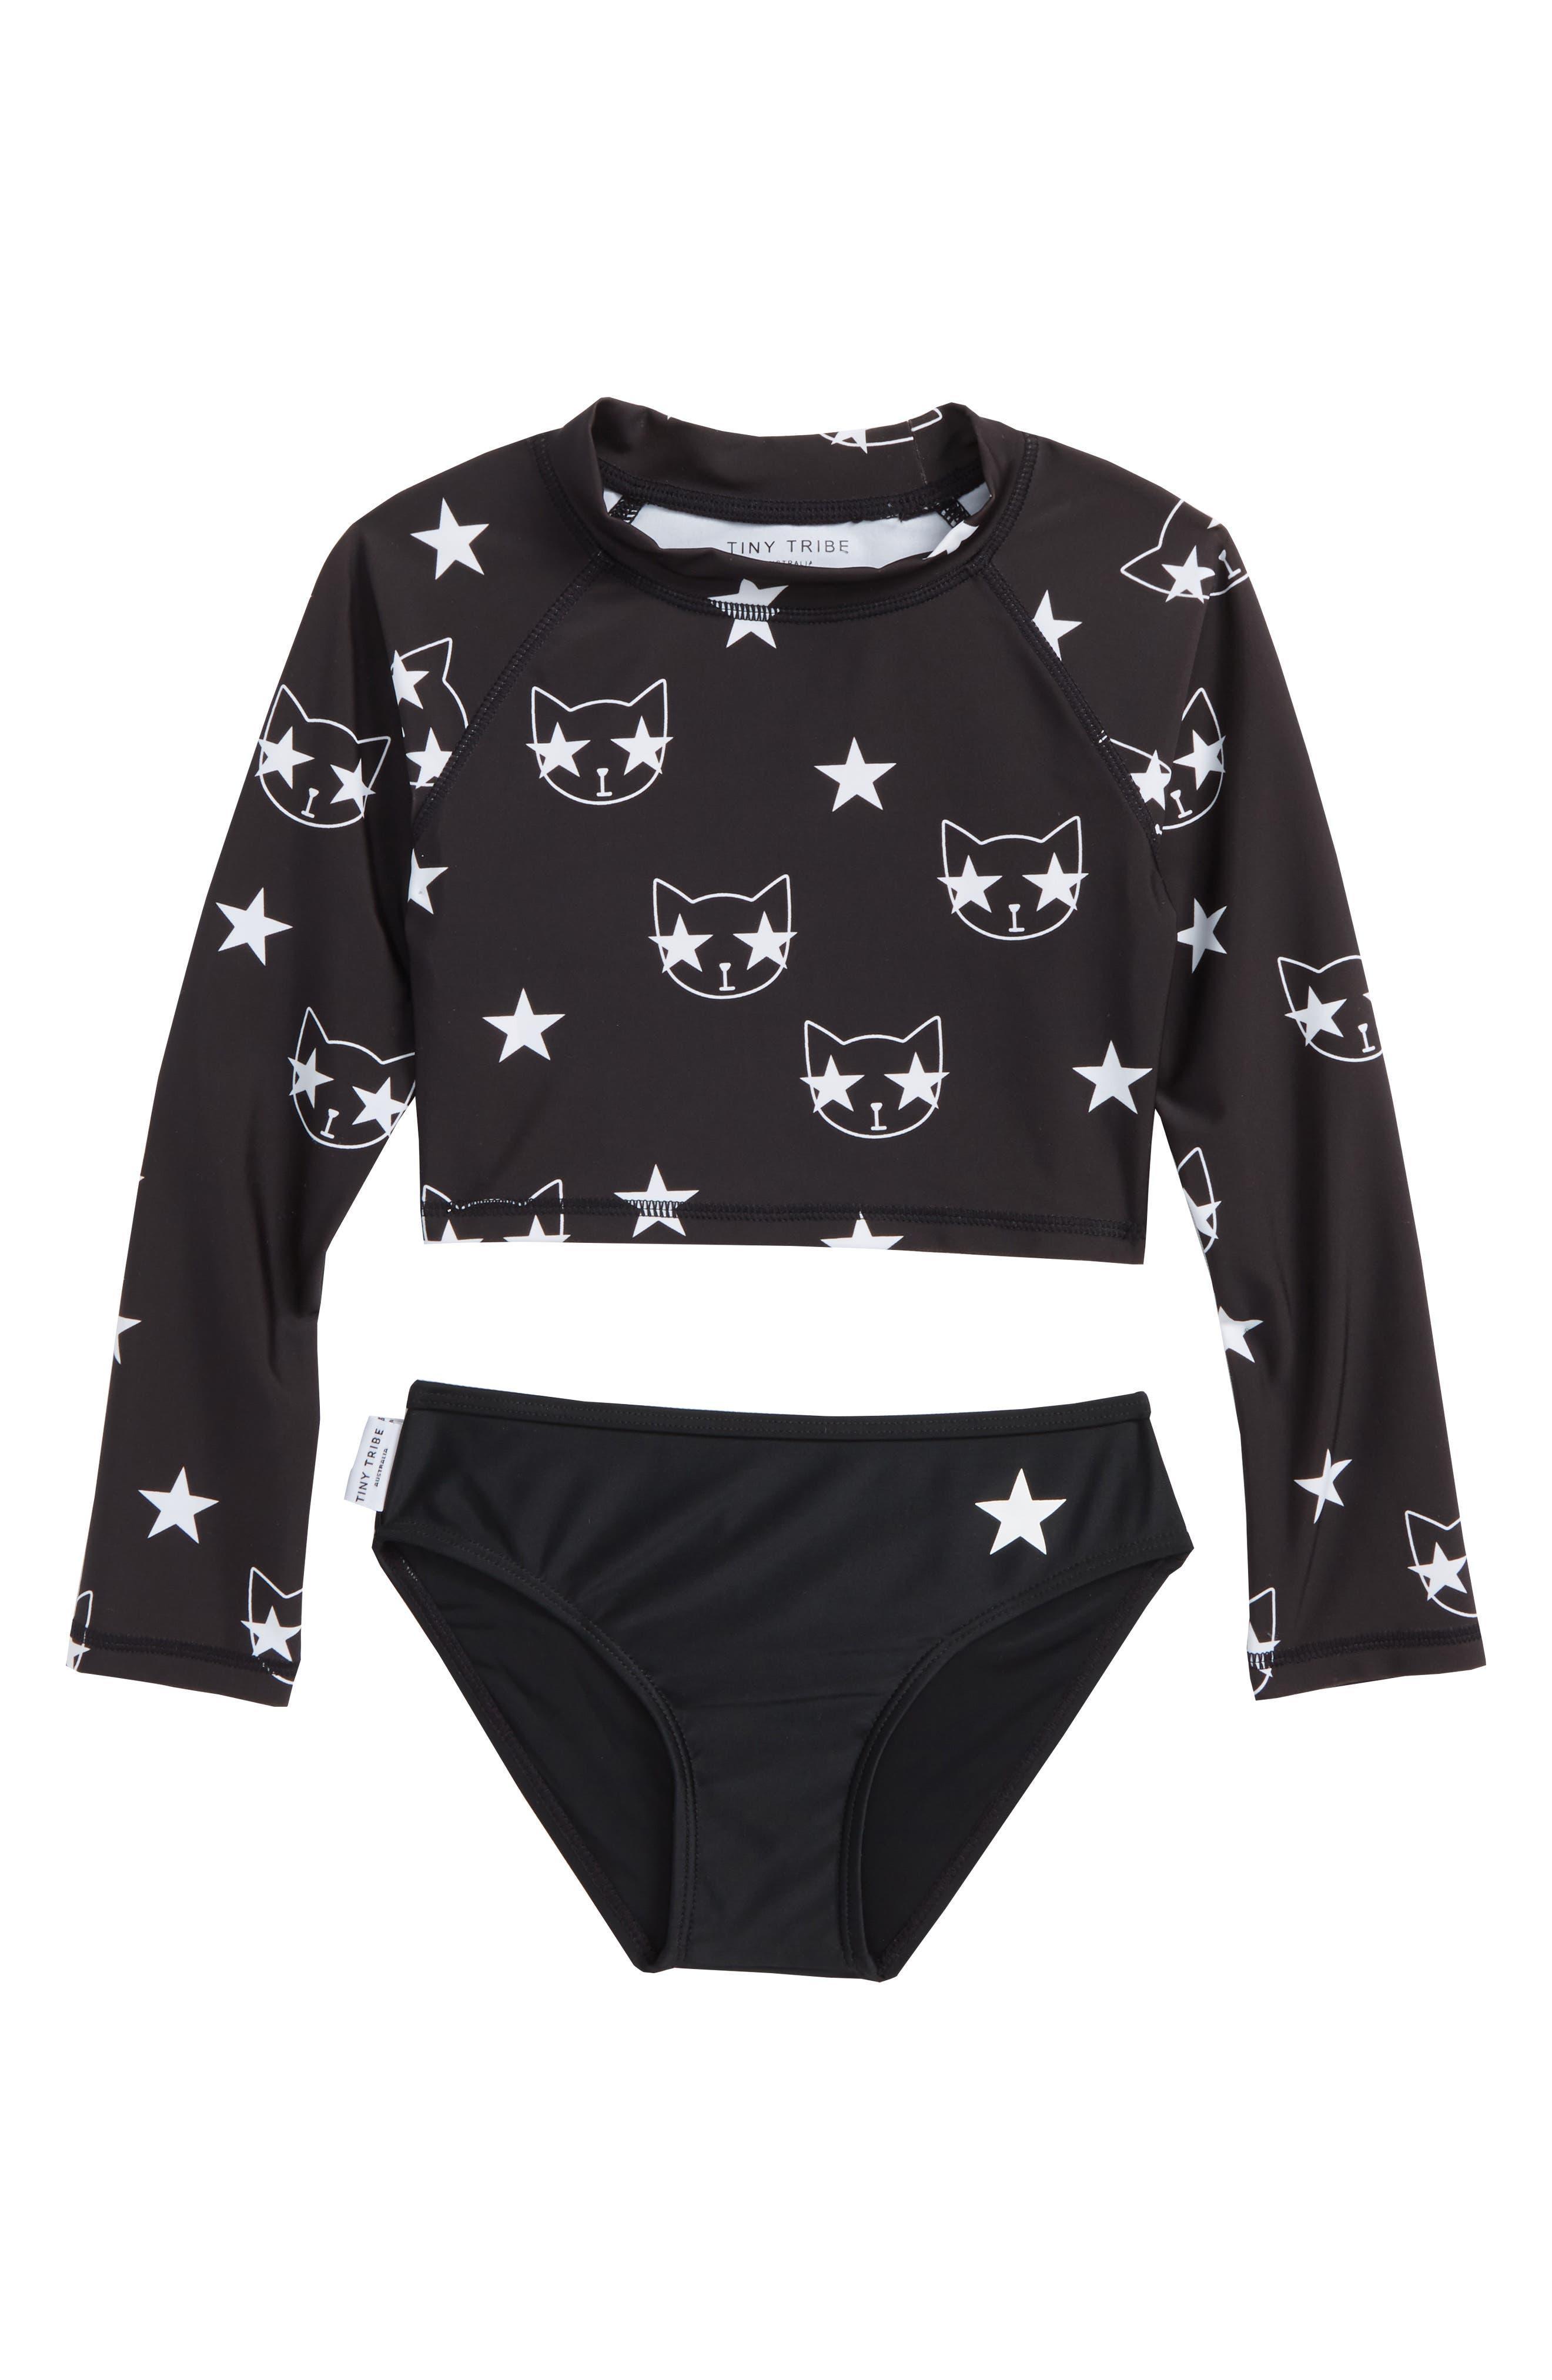 Starcat Two-Piece Rashguard Swimsuit,                         Main,                         color, Black